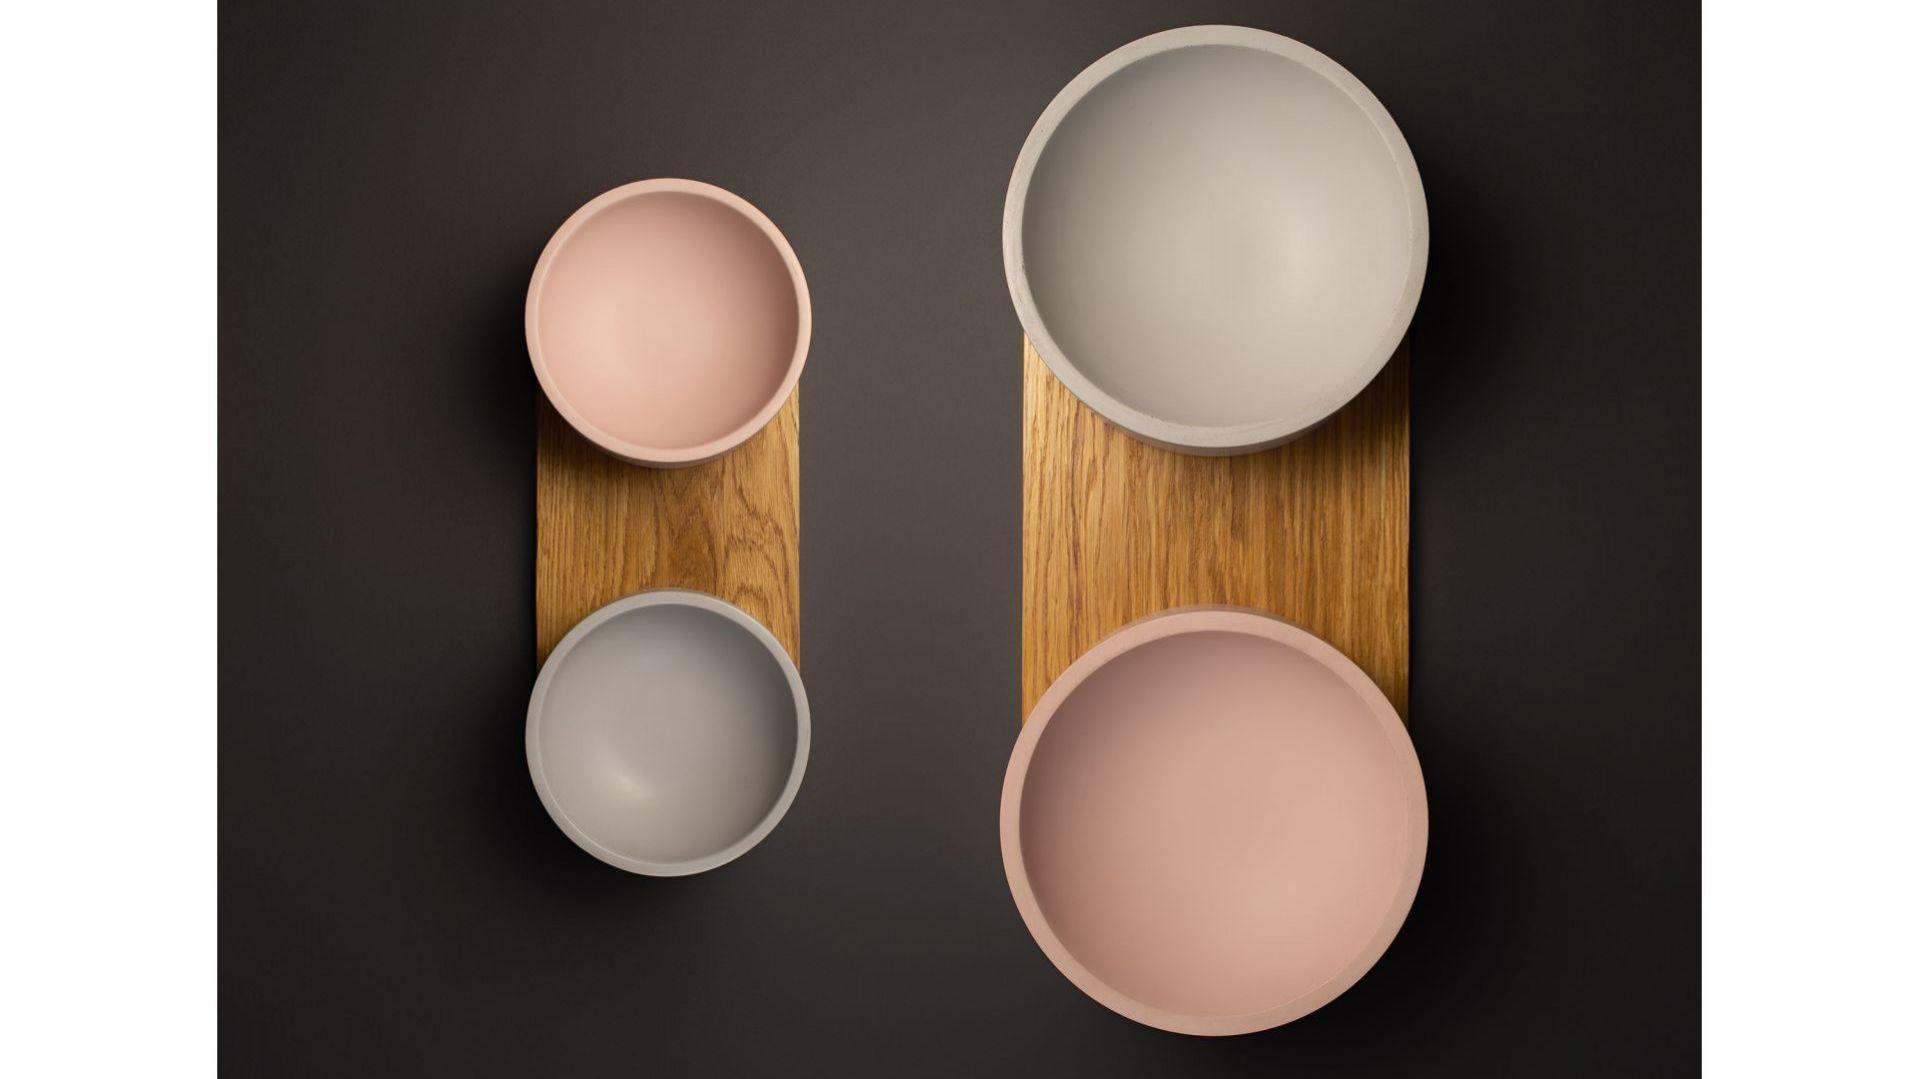 VUKU Double Buffet/Labbvenn. Produkt zgłoszony do konkursu Dobry Design 2019.